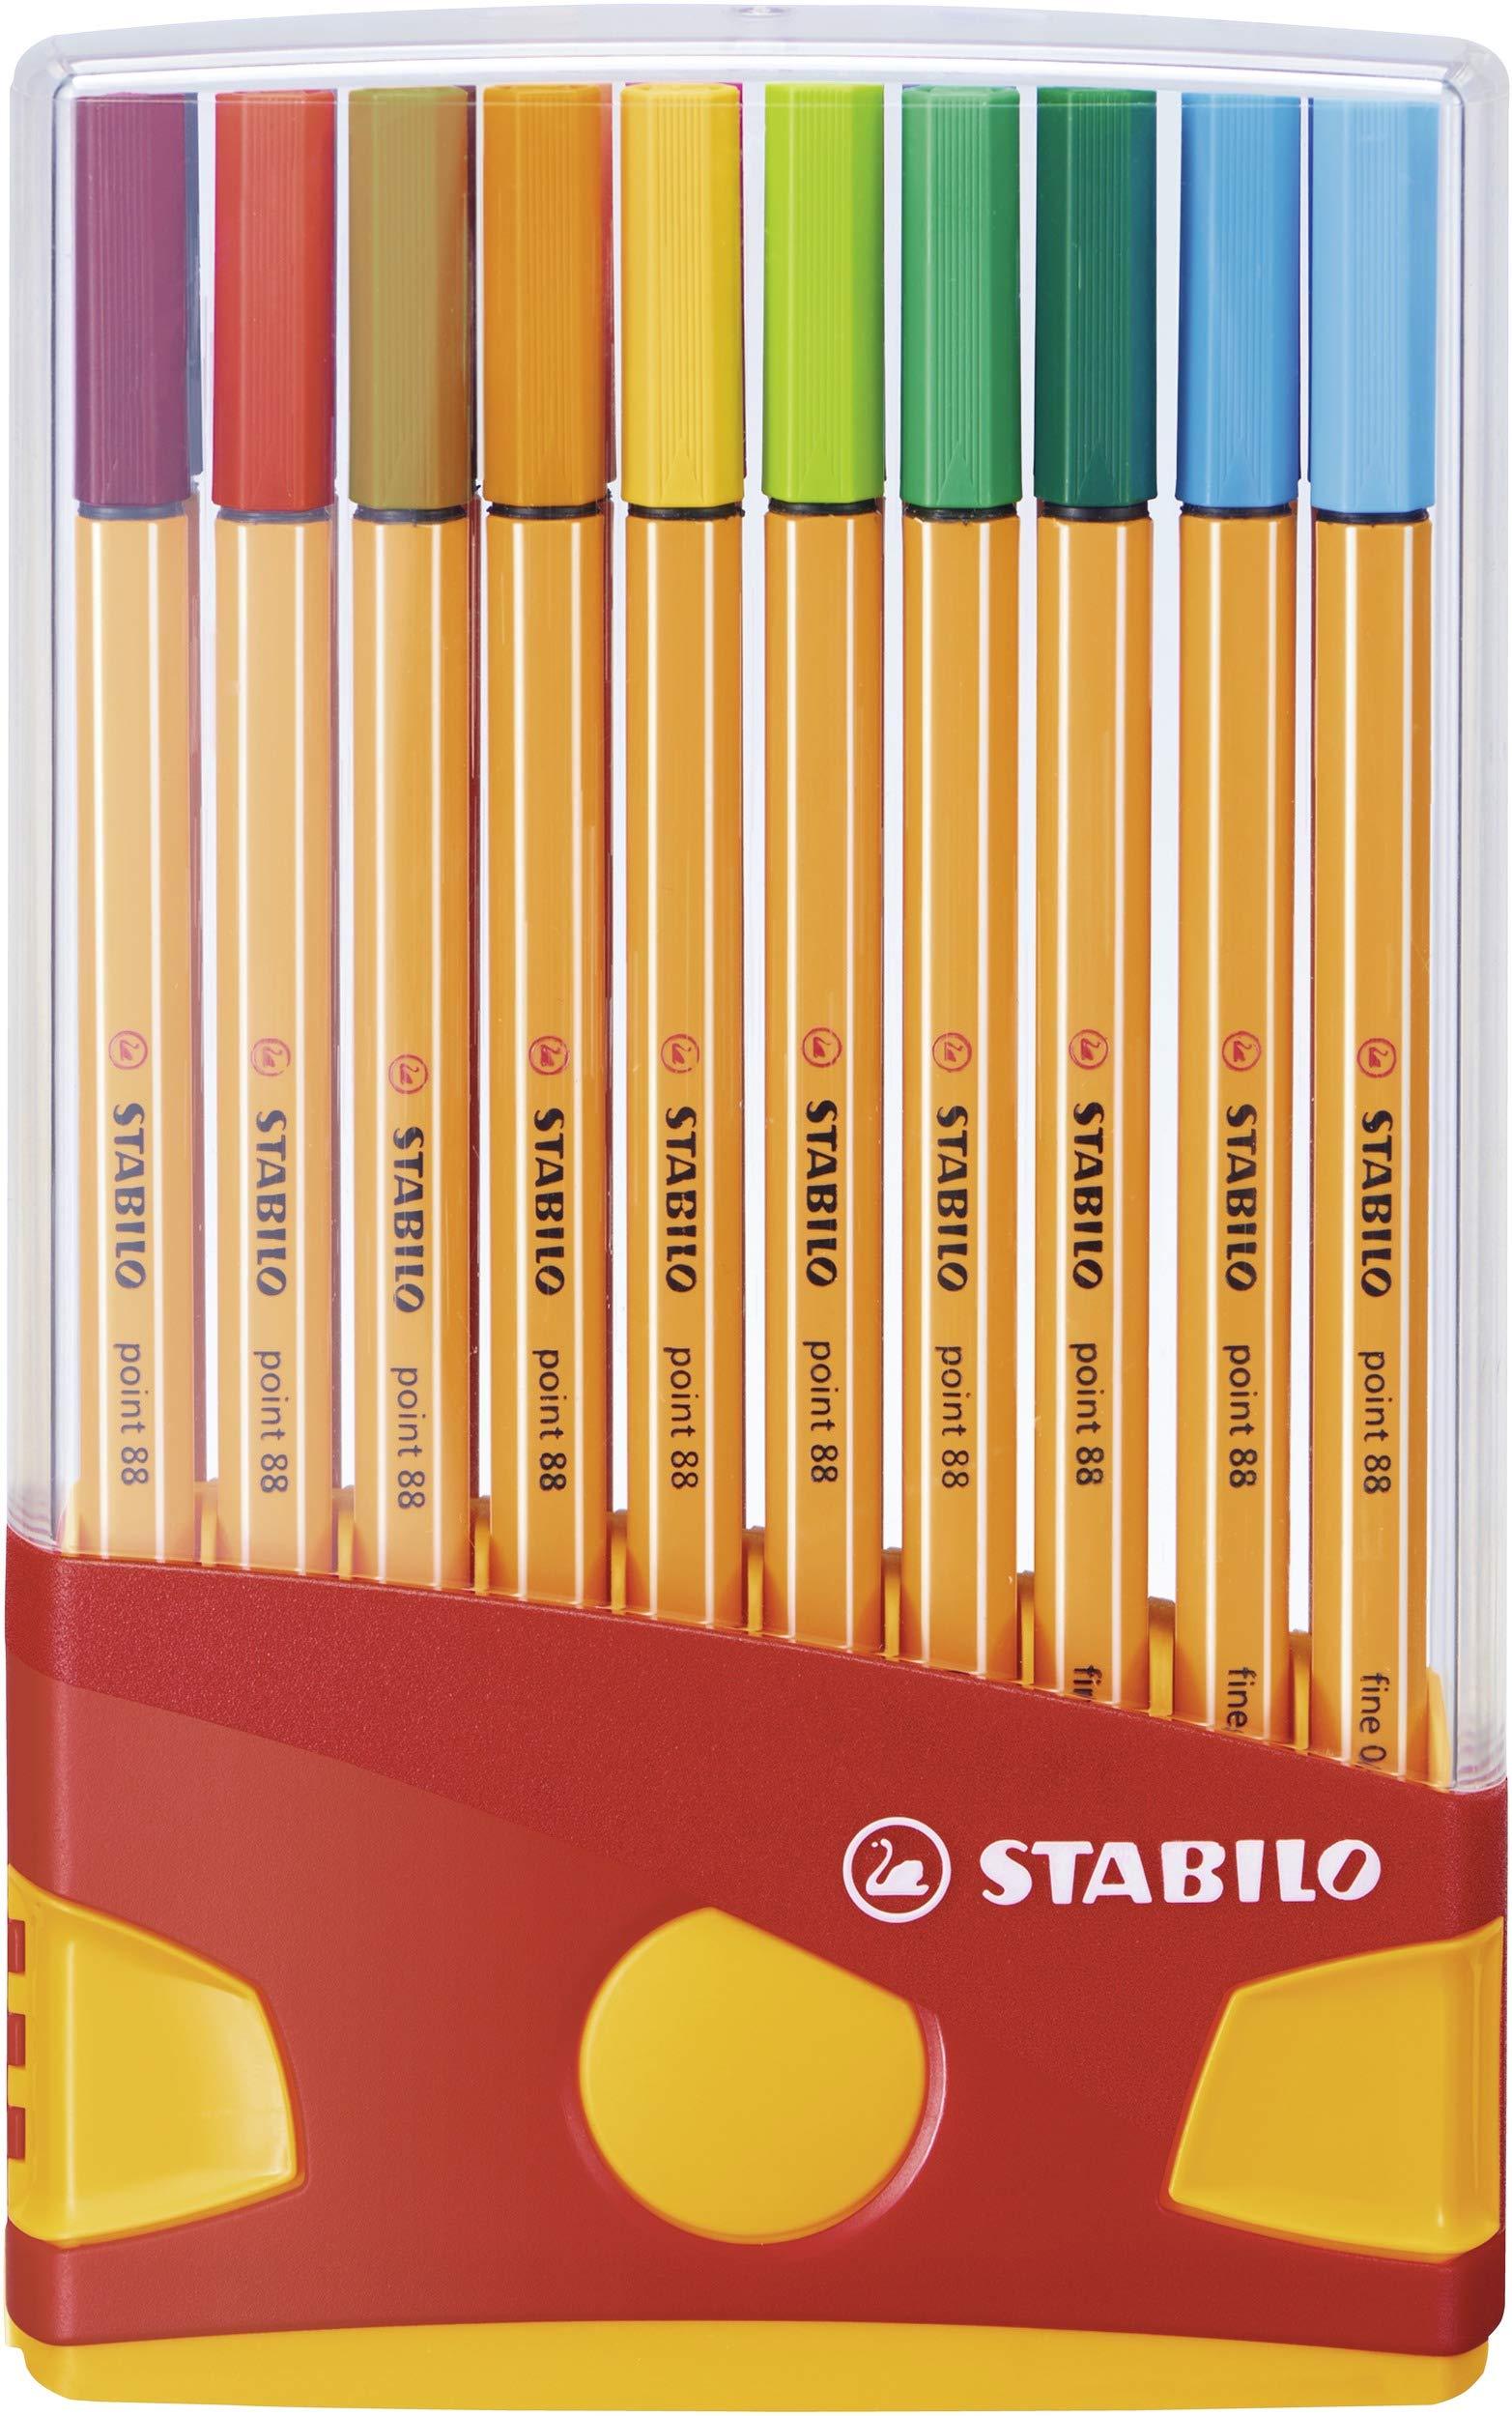 Stabilo Point 88 Pen Set (Set of 20)